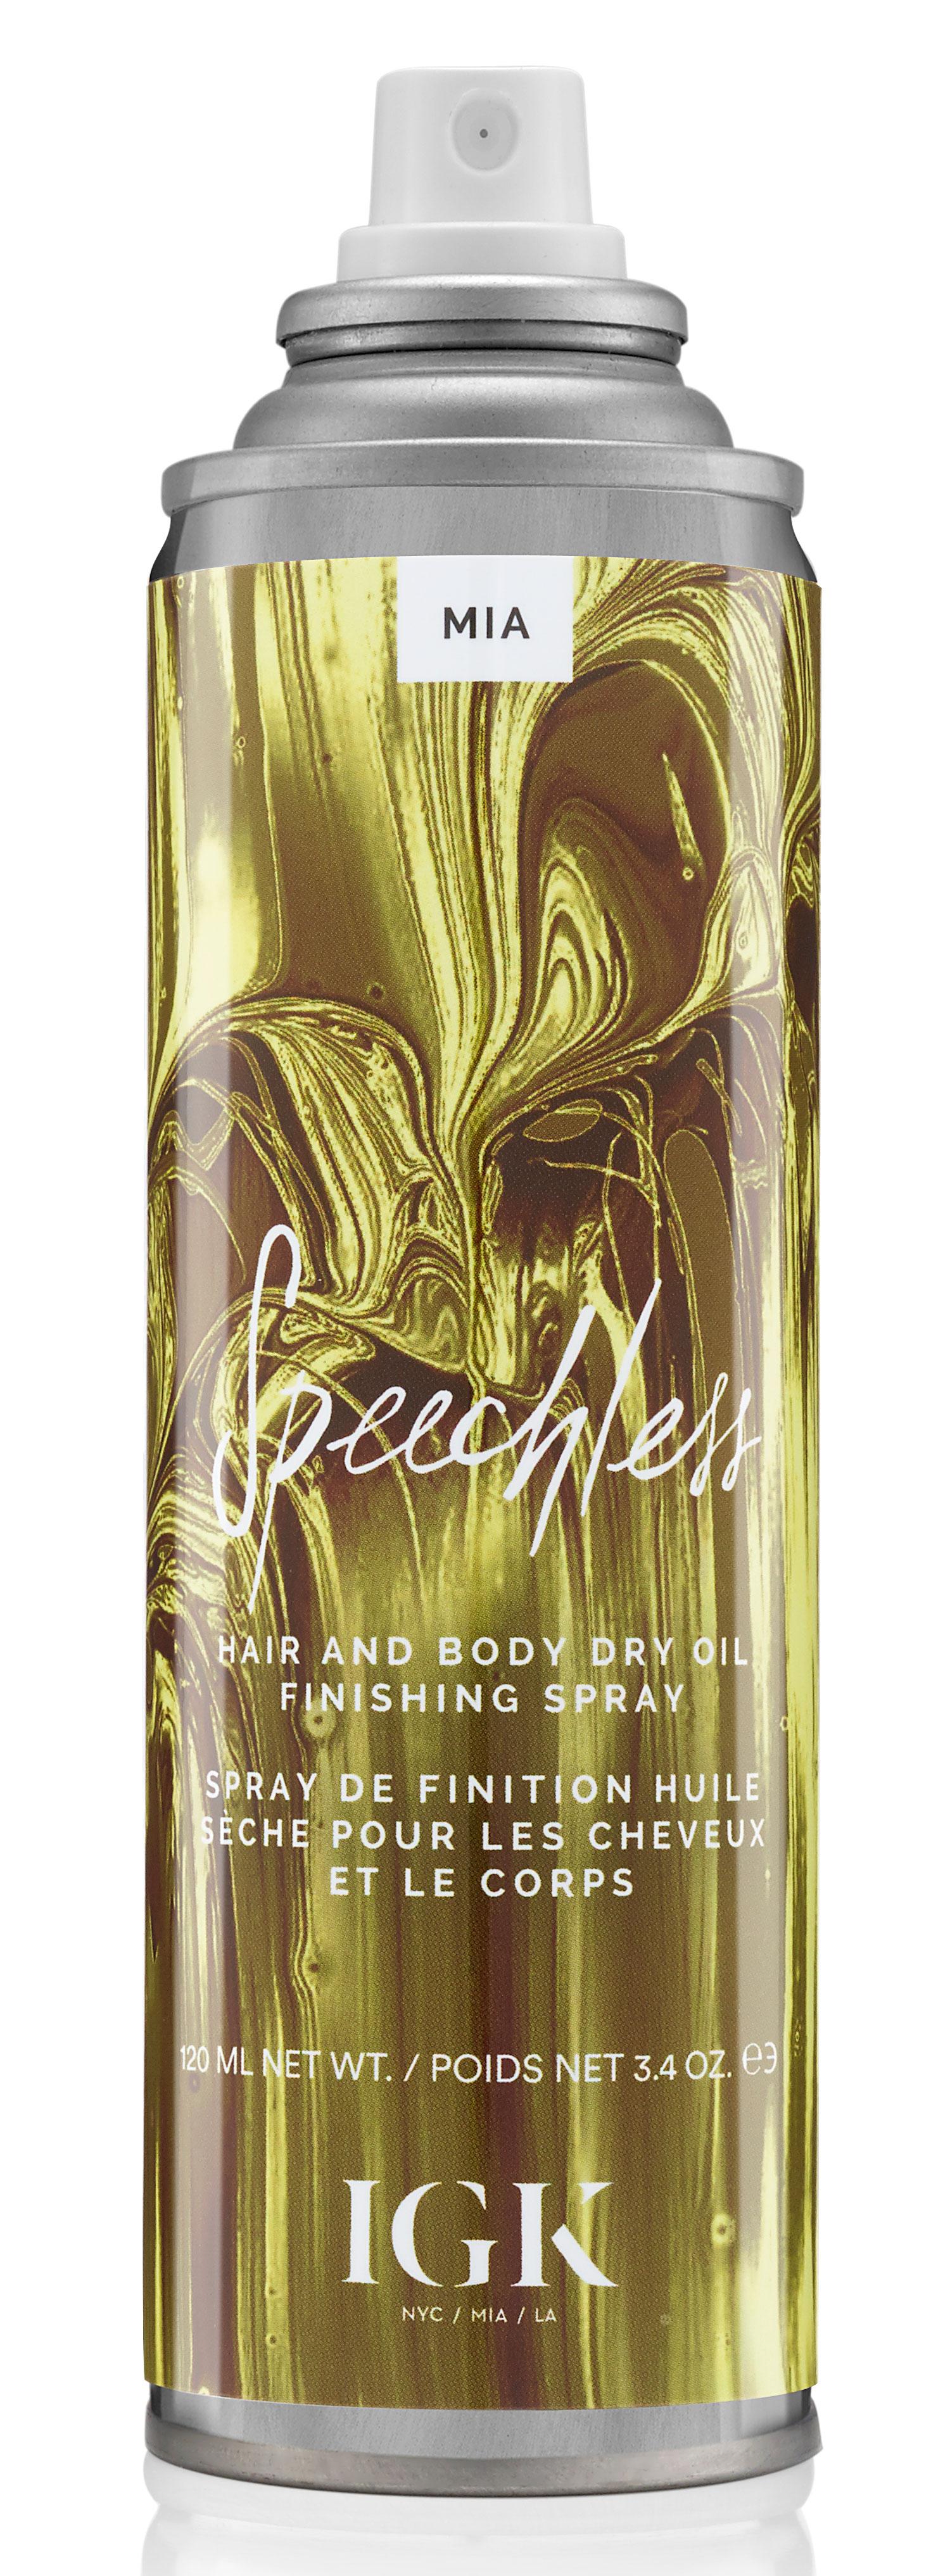 IGK SPEECHLESS Hair and Body Dry Oil